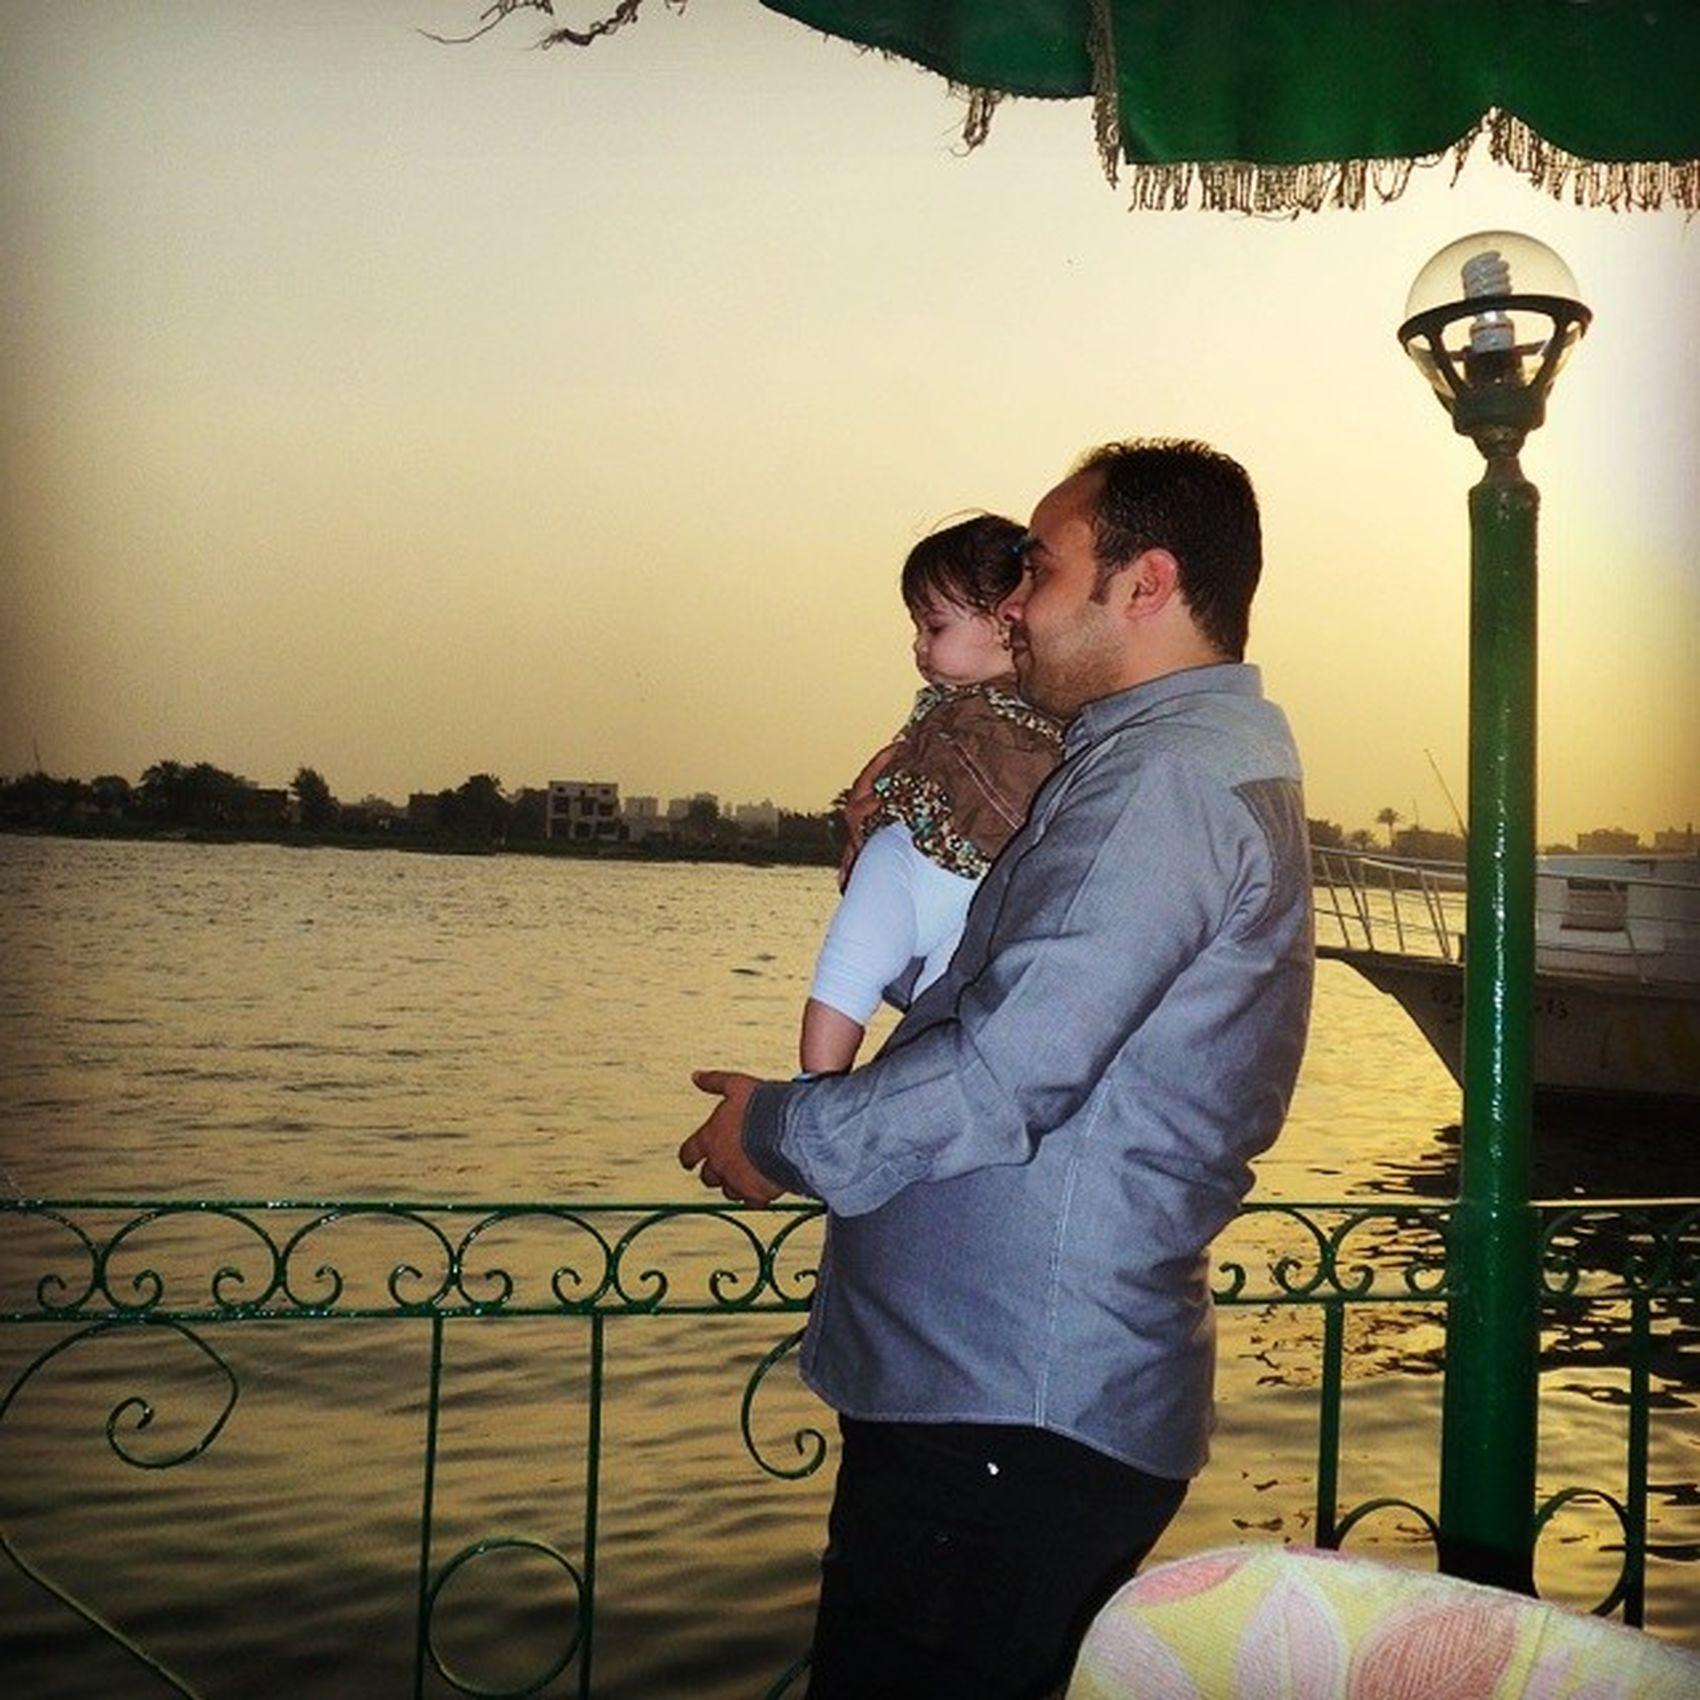 Rawda My Niece  Kid baby girl cute kids nile Egypt cairo sunset brother